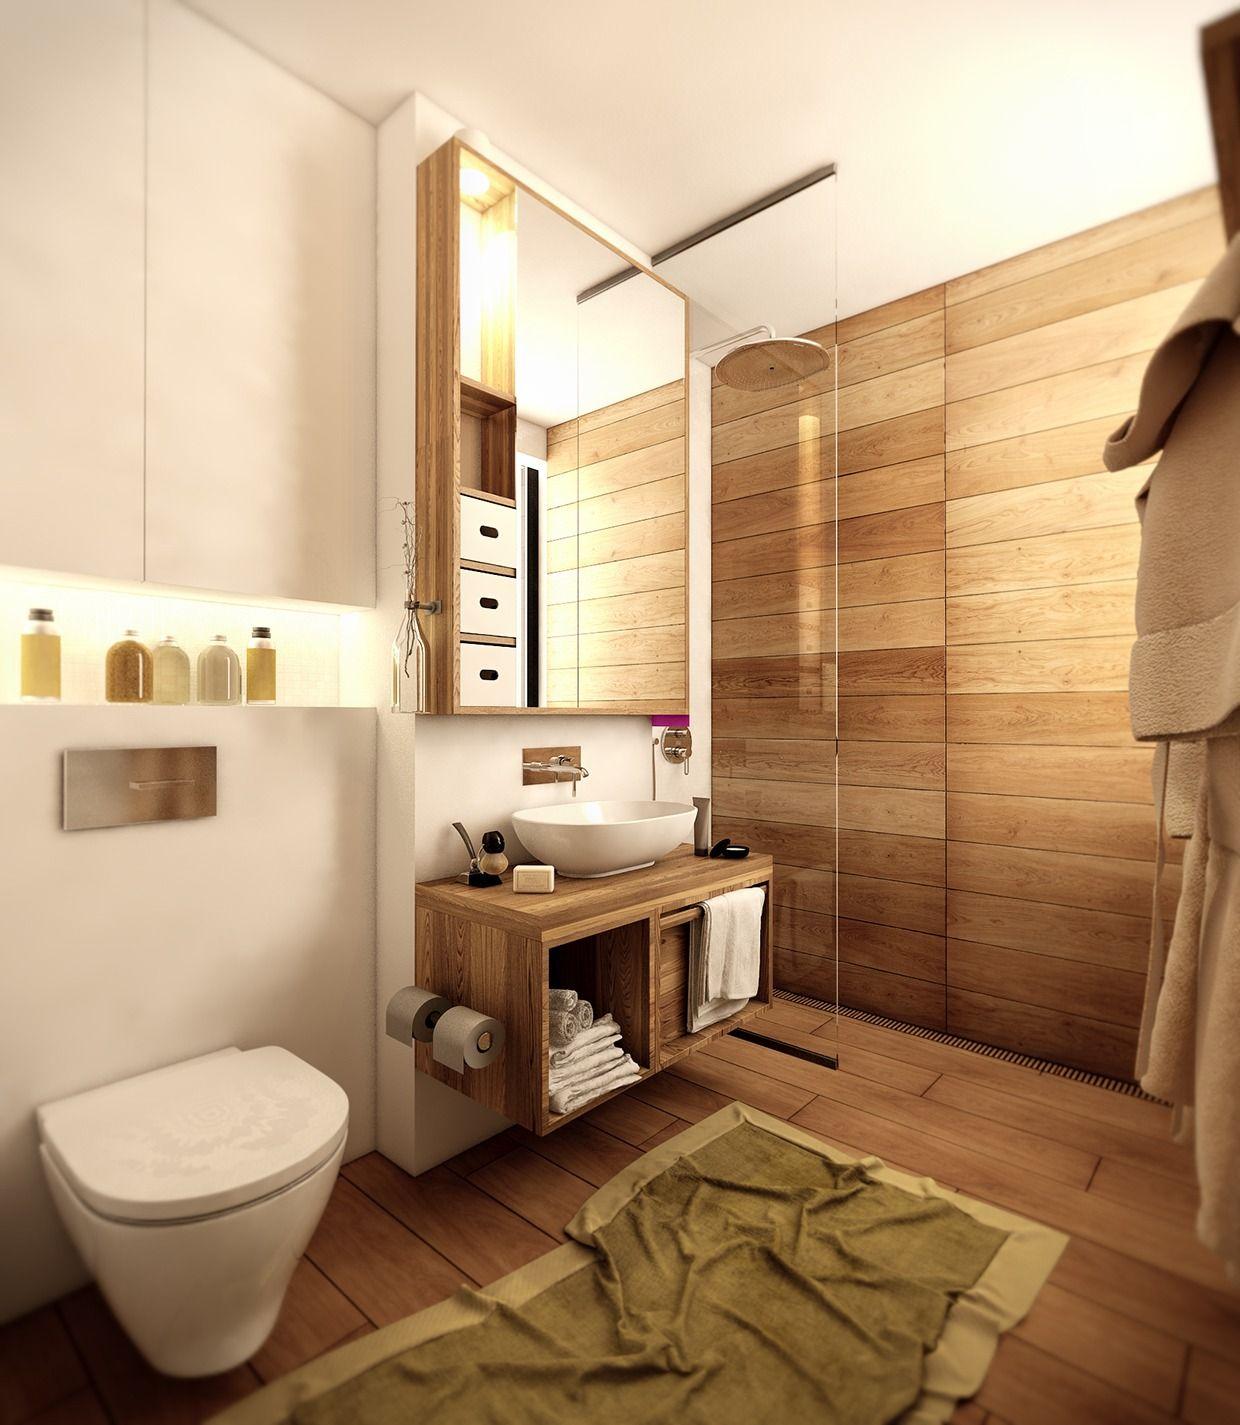 Best Wood Flooring In Bathroom Design Ideas & Remodel ...  |Best Wood Floor For Bathrooms